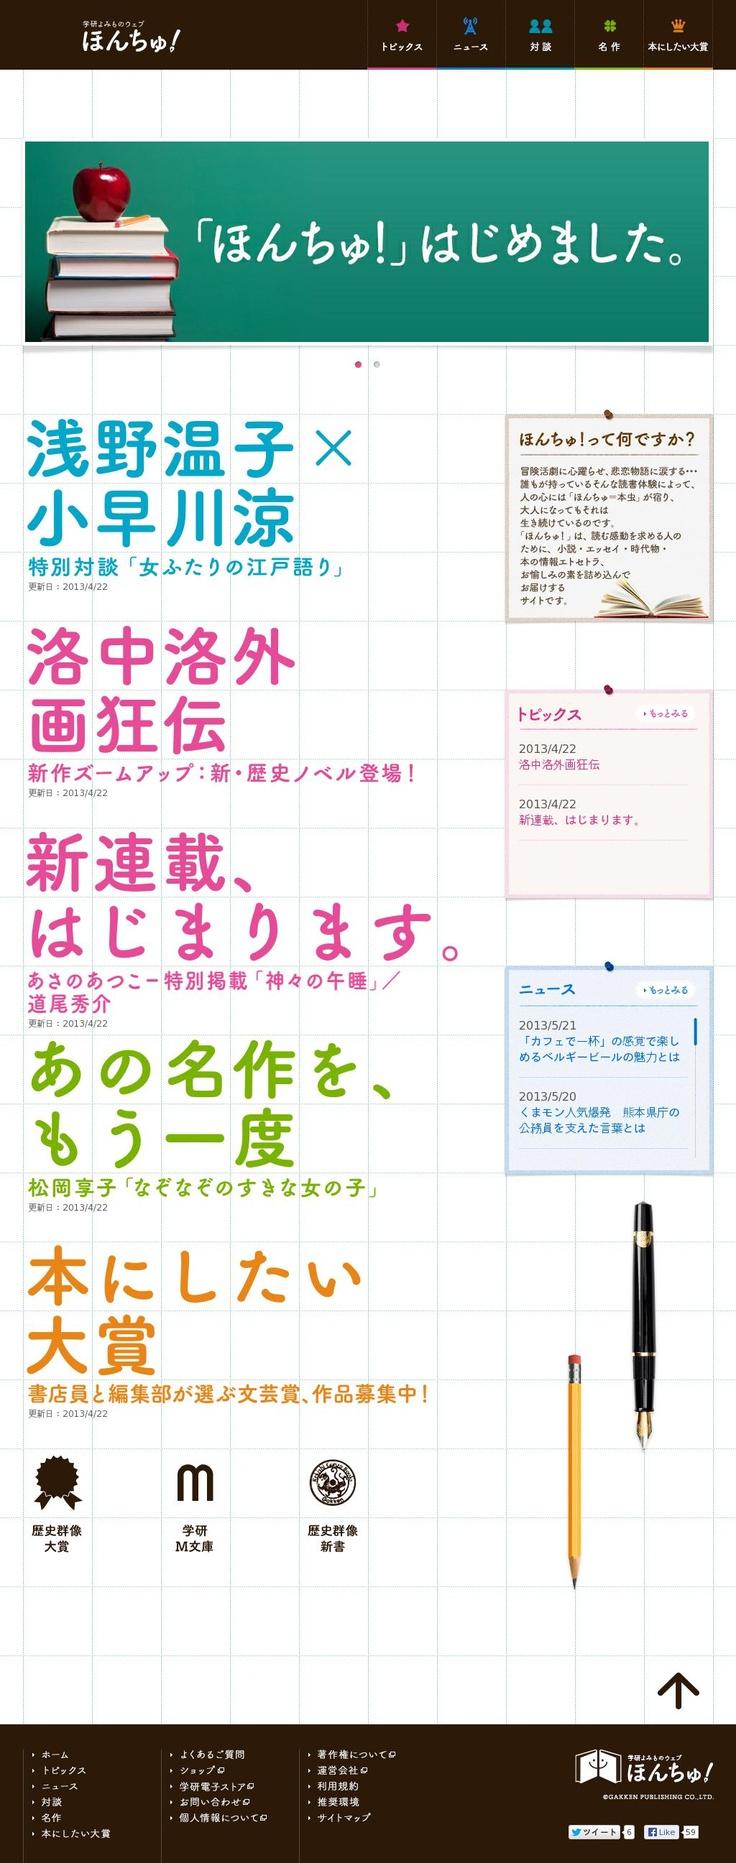 The website http://honchu.jp/ courtesy of @Pinstamatic (http://pinstamatic.com)